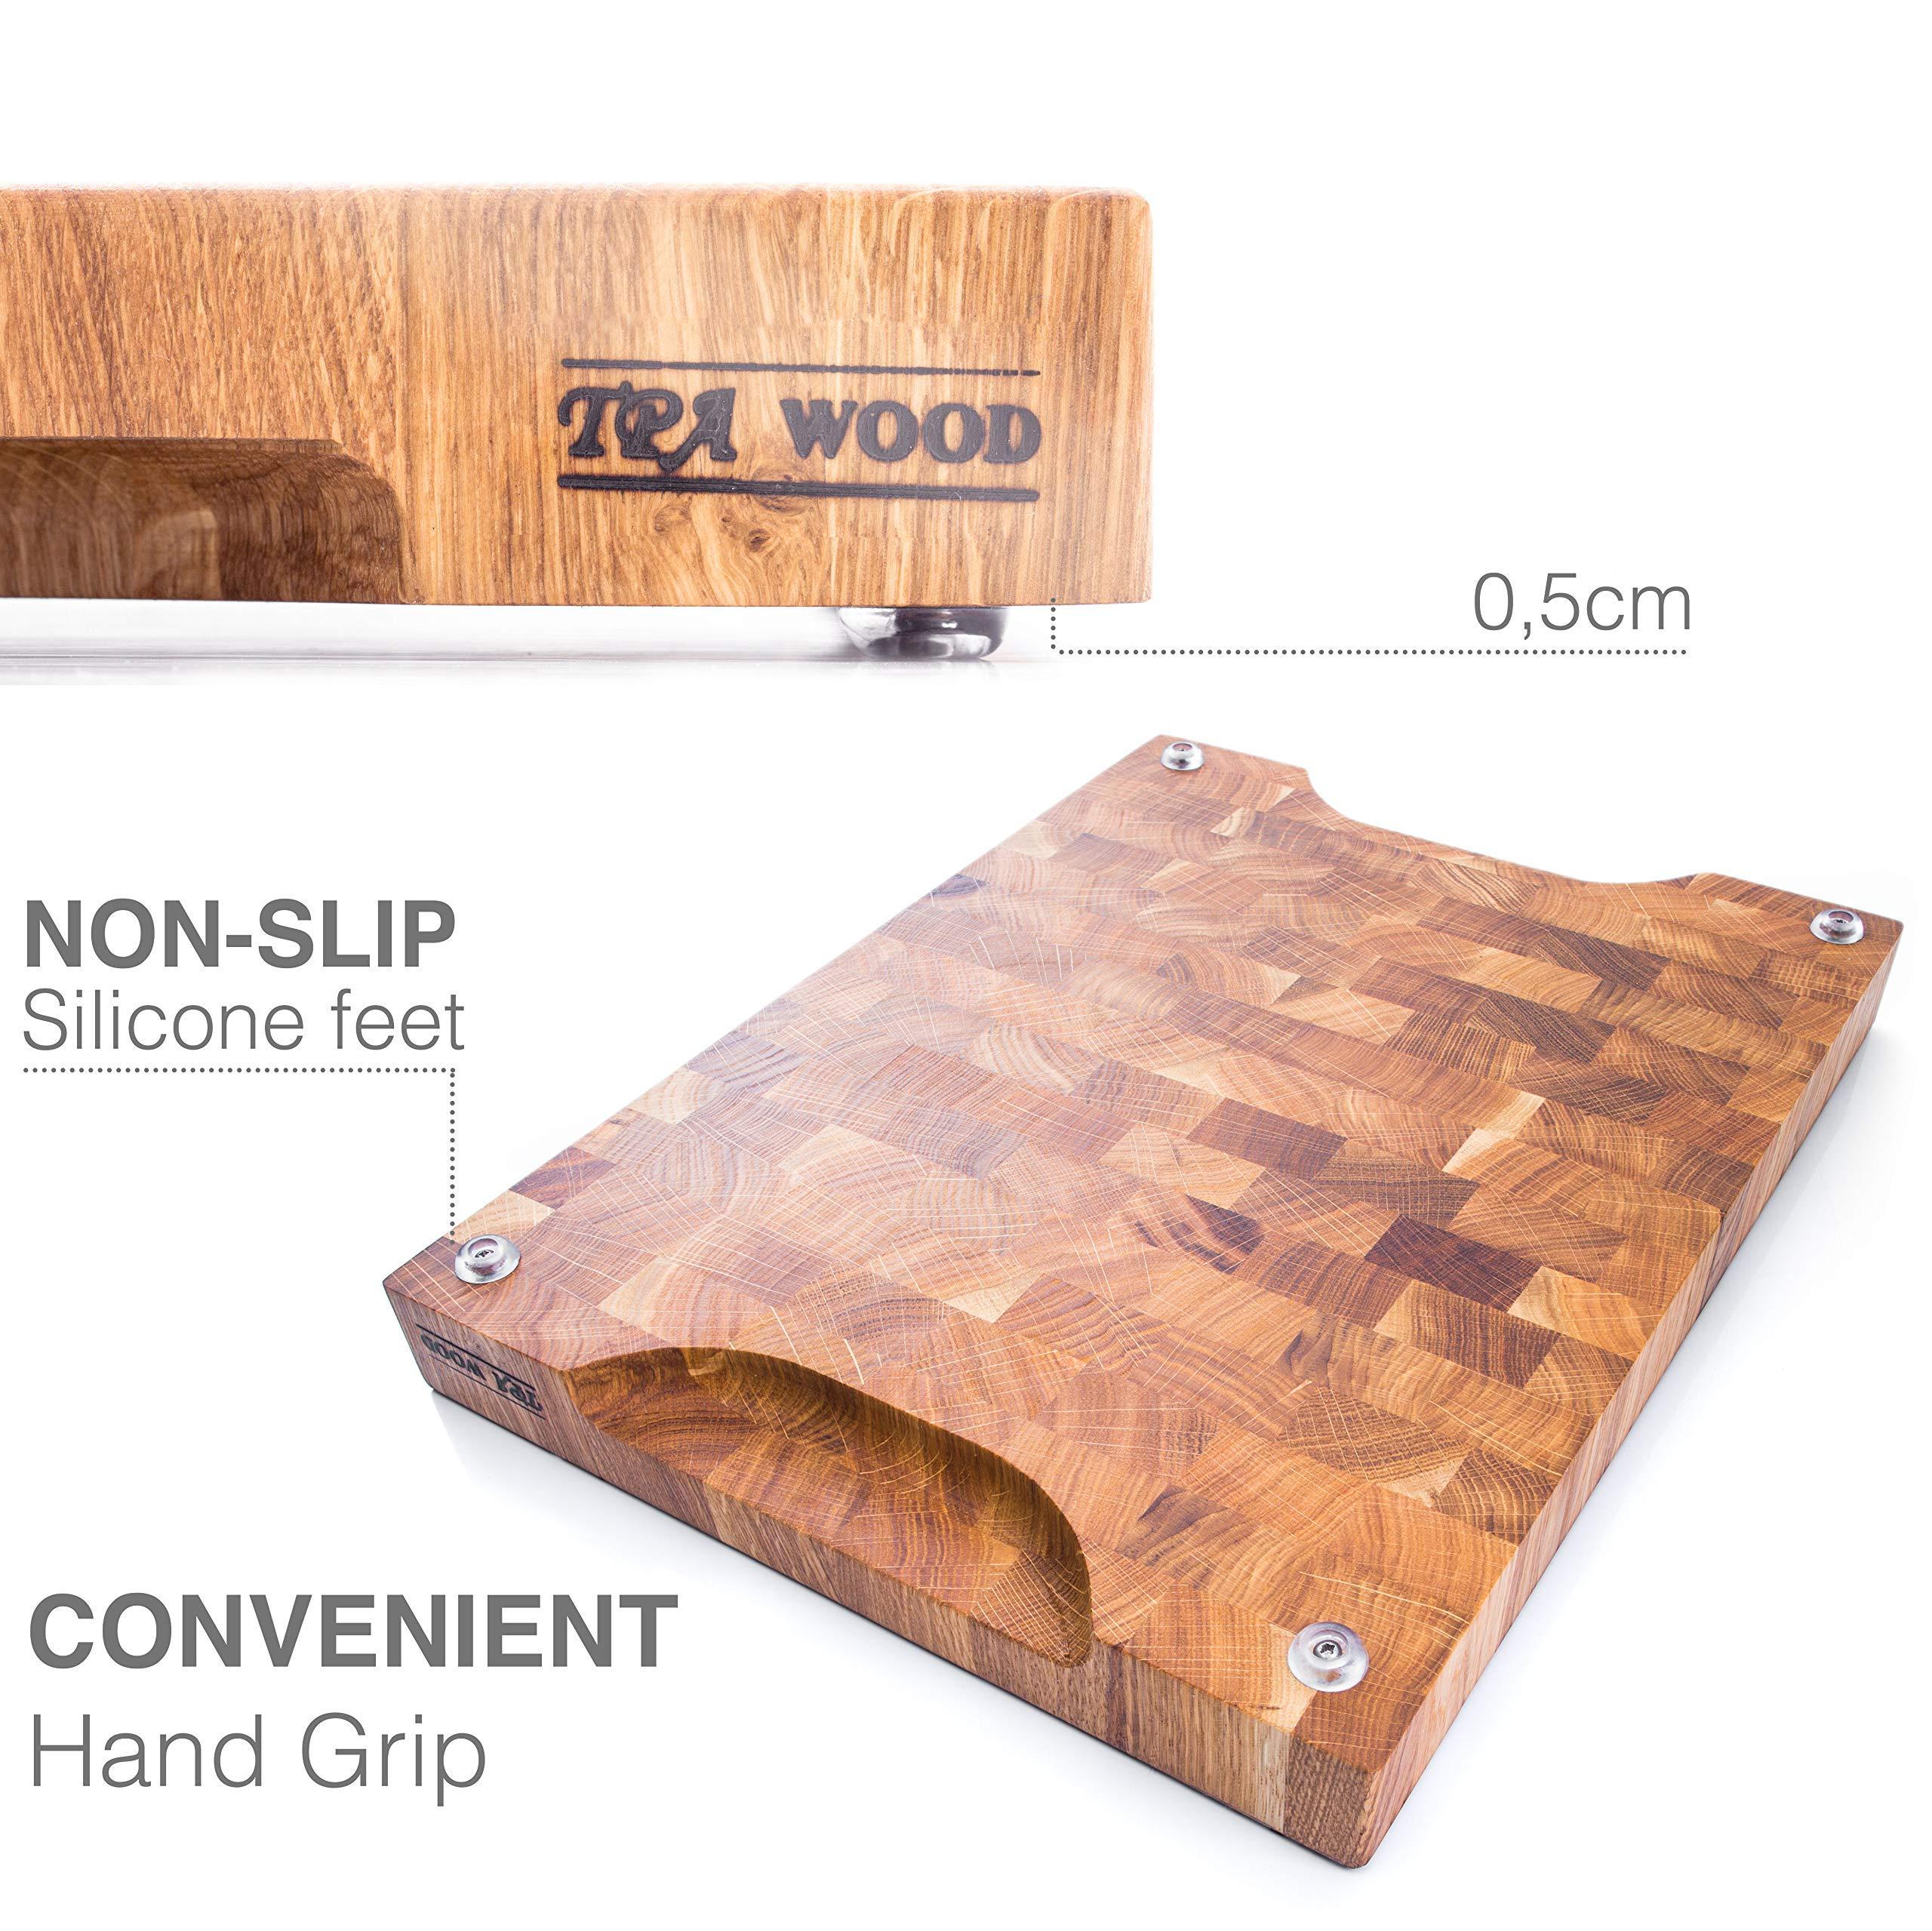 End Grain Wood cutting board - Wood Chopping block - Large cutting board 16 x 12 Kitchen butcher block Oak cutting board non slip cutting board with feet - Kitchen Wooden chopping board by TPA Wood (Image #1)